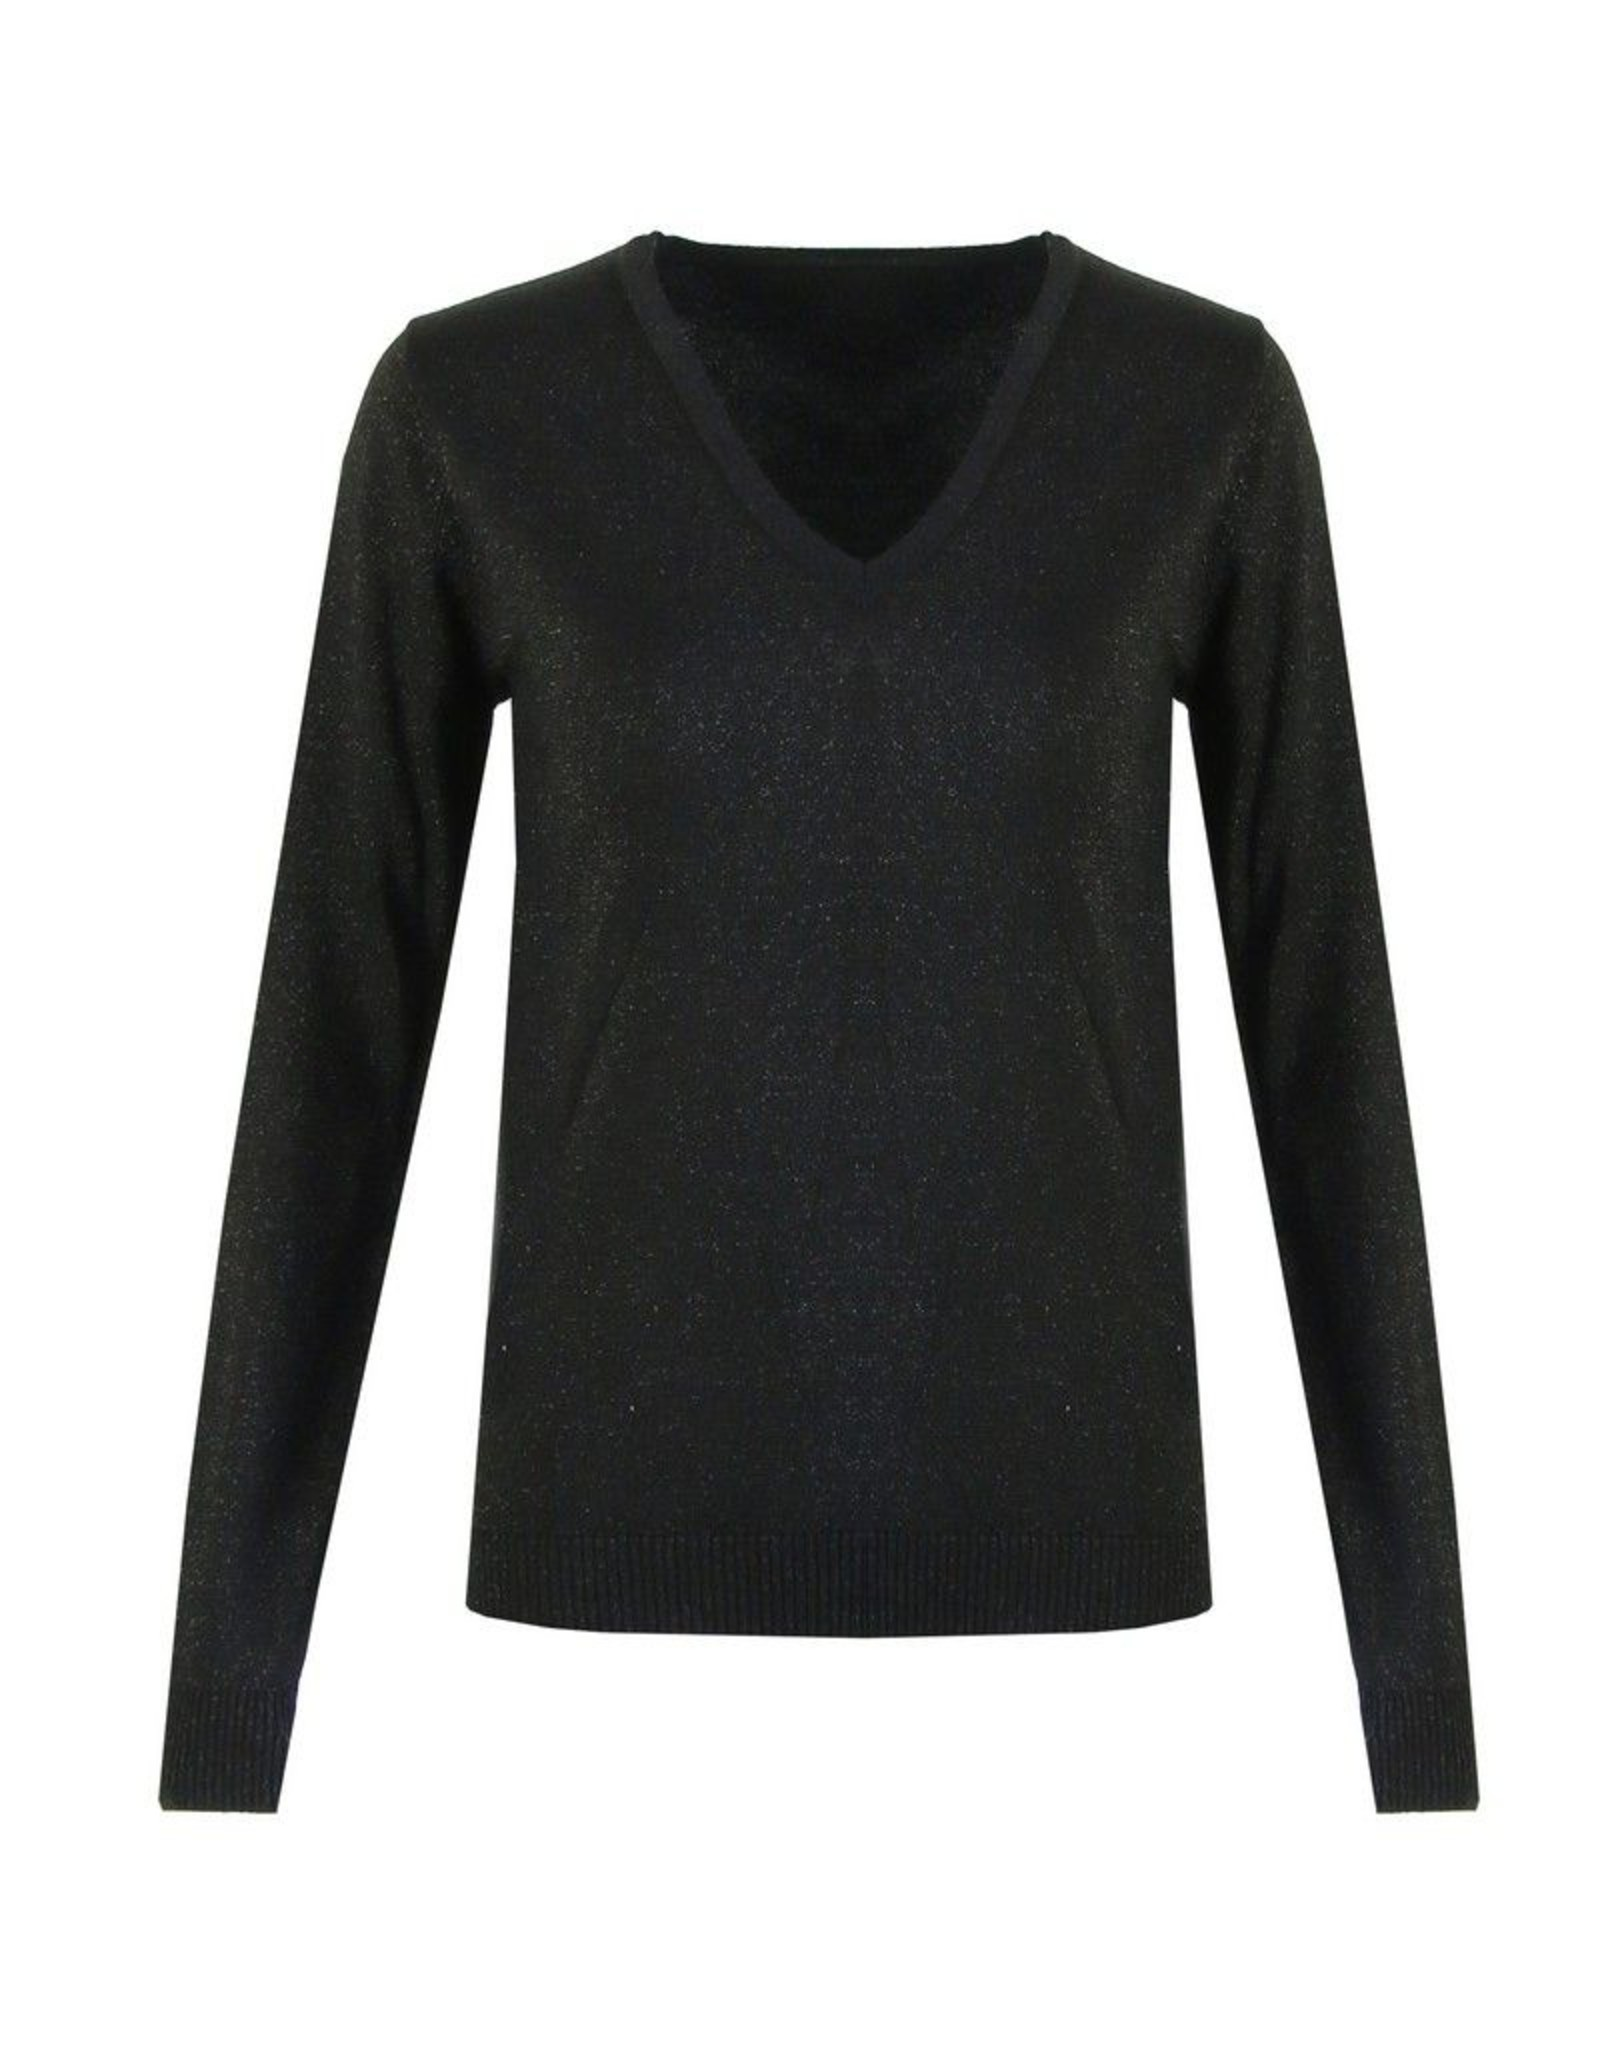 David & Alex  Sweater Black with glitter